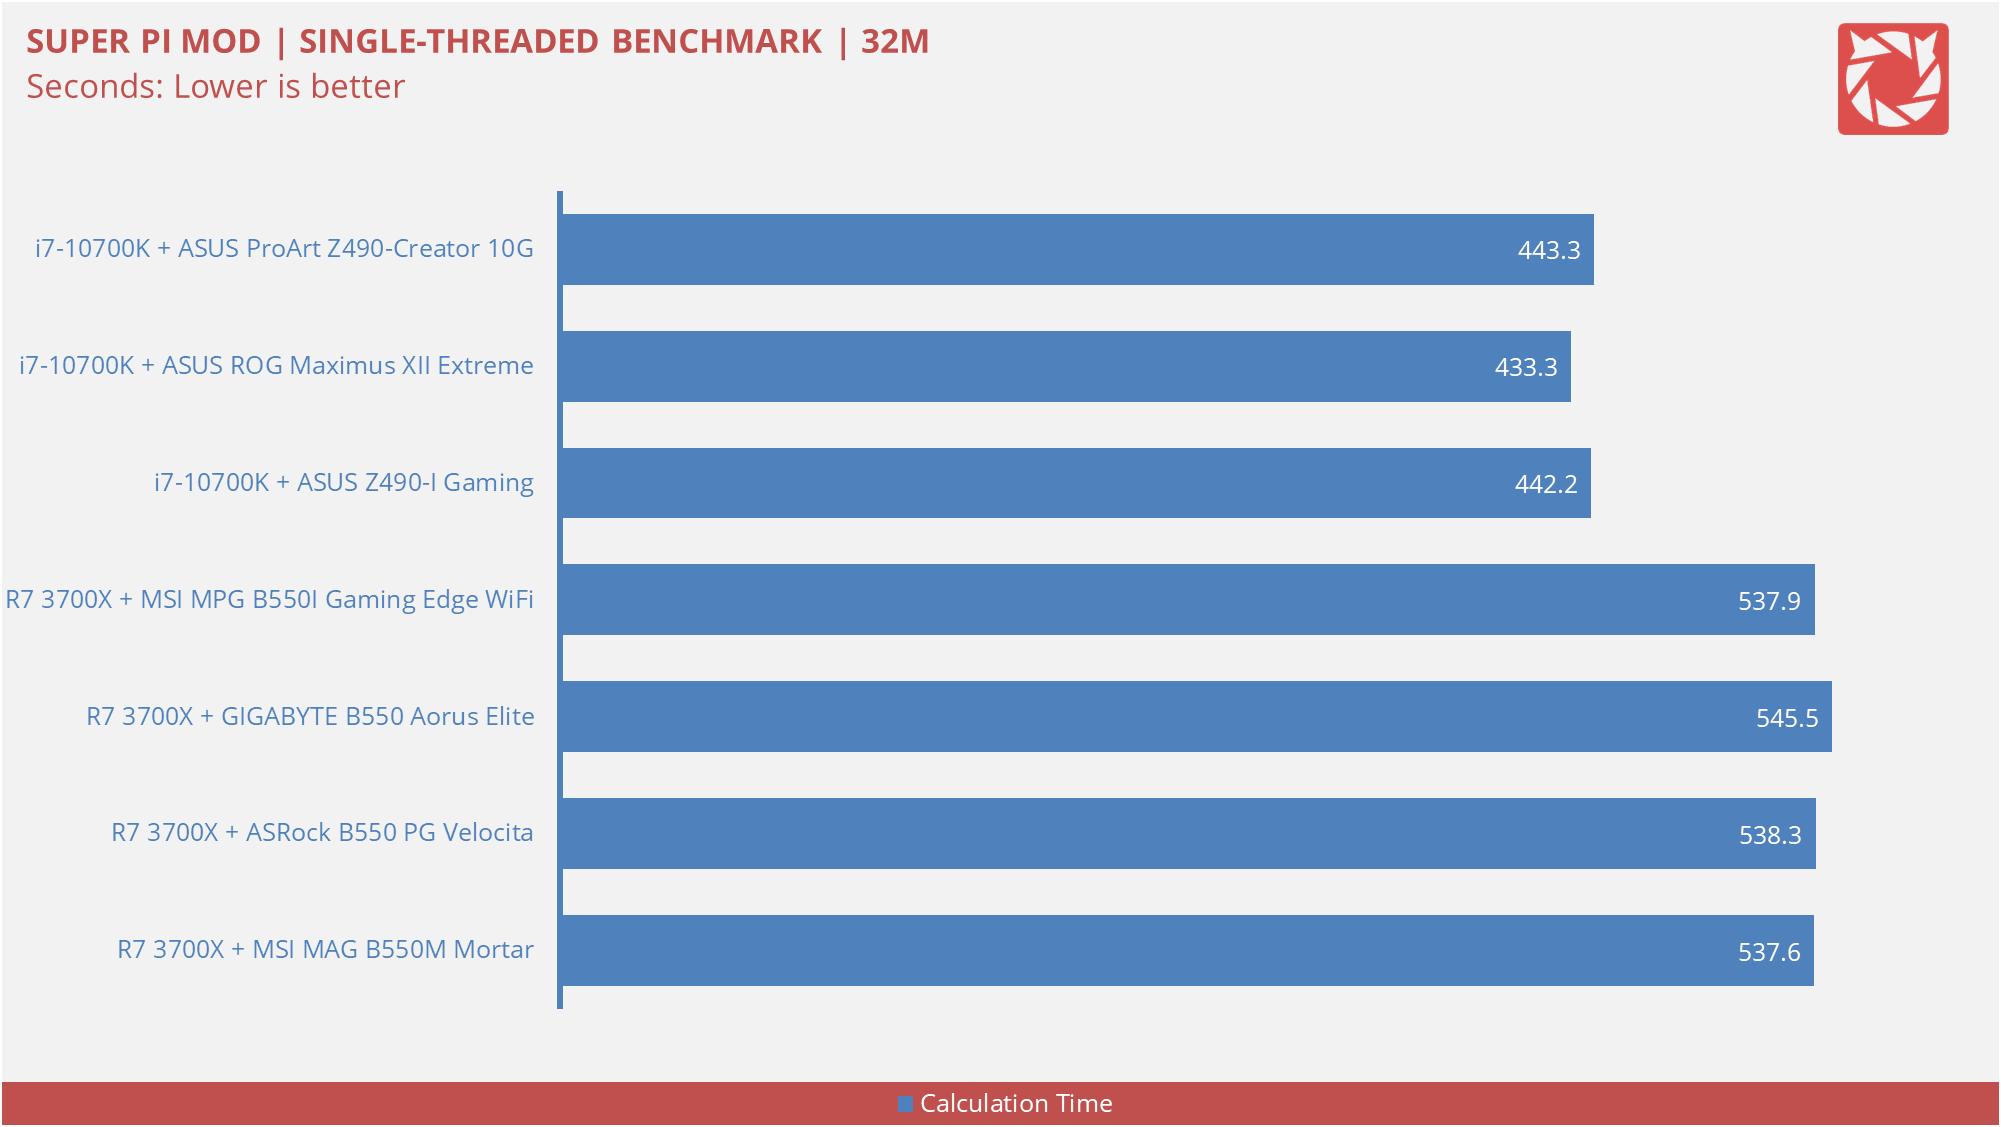 ASUS Z490 I Gaming Benchmarks 1